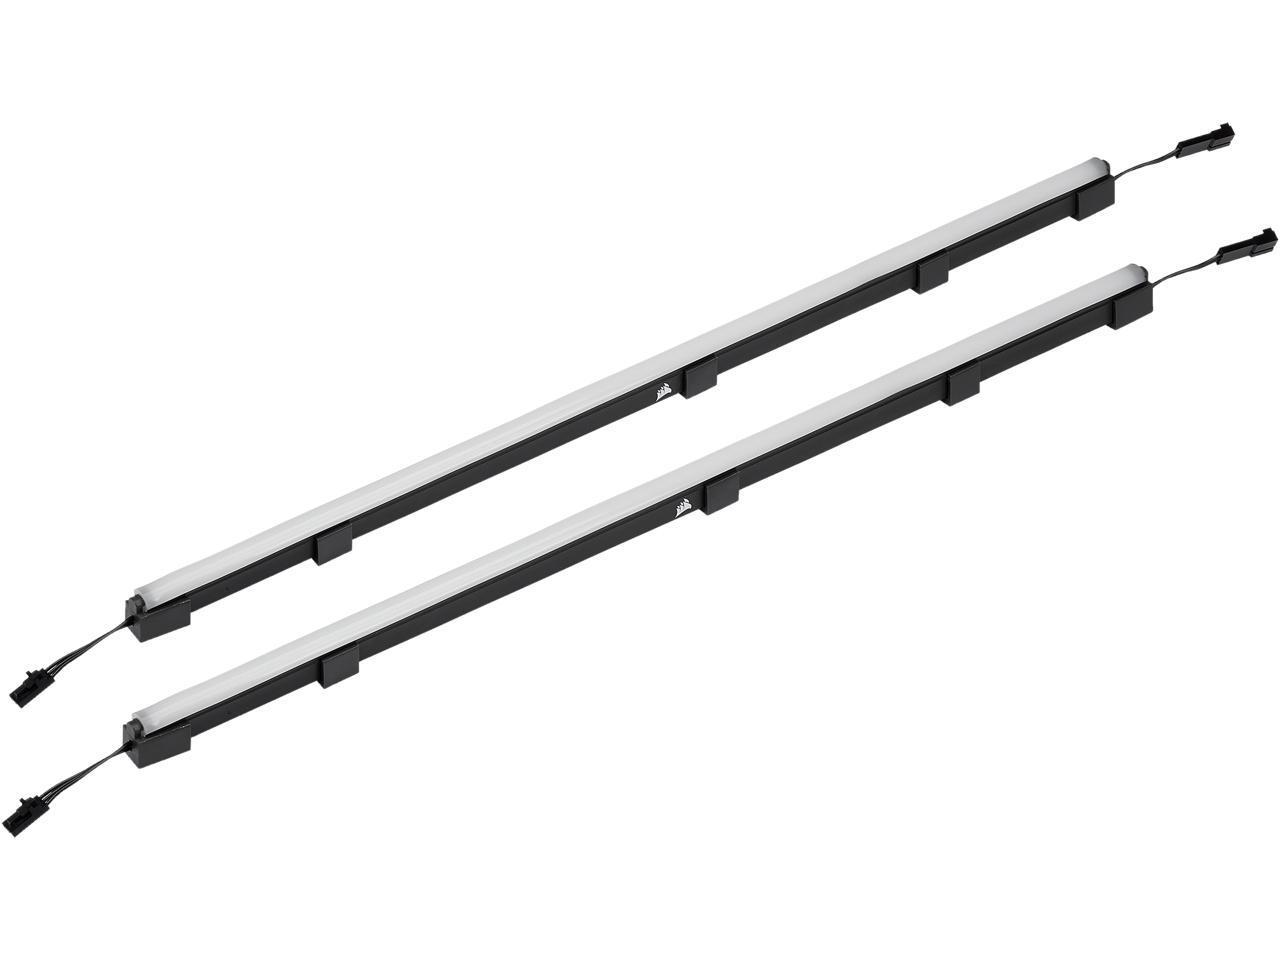 CORSAIR iCUE LS100 Smart Lighting Strip Expansion Kit 450mm,